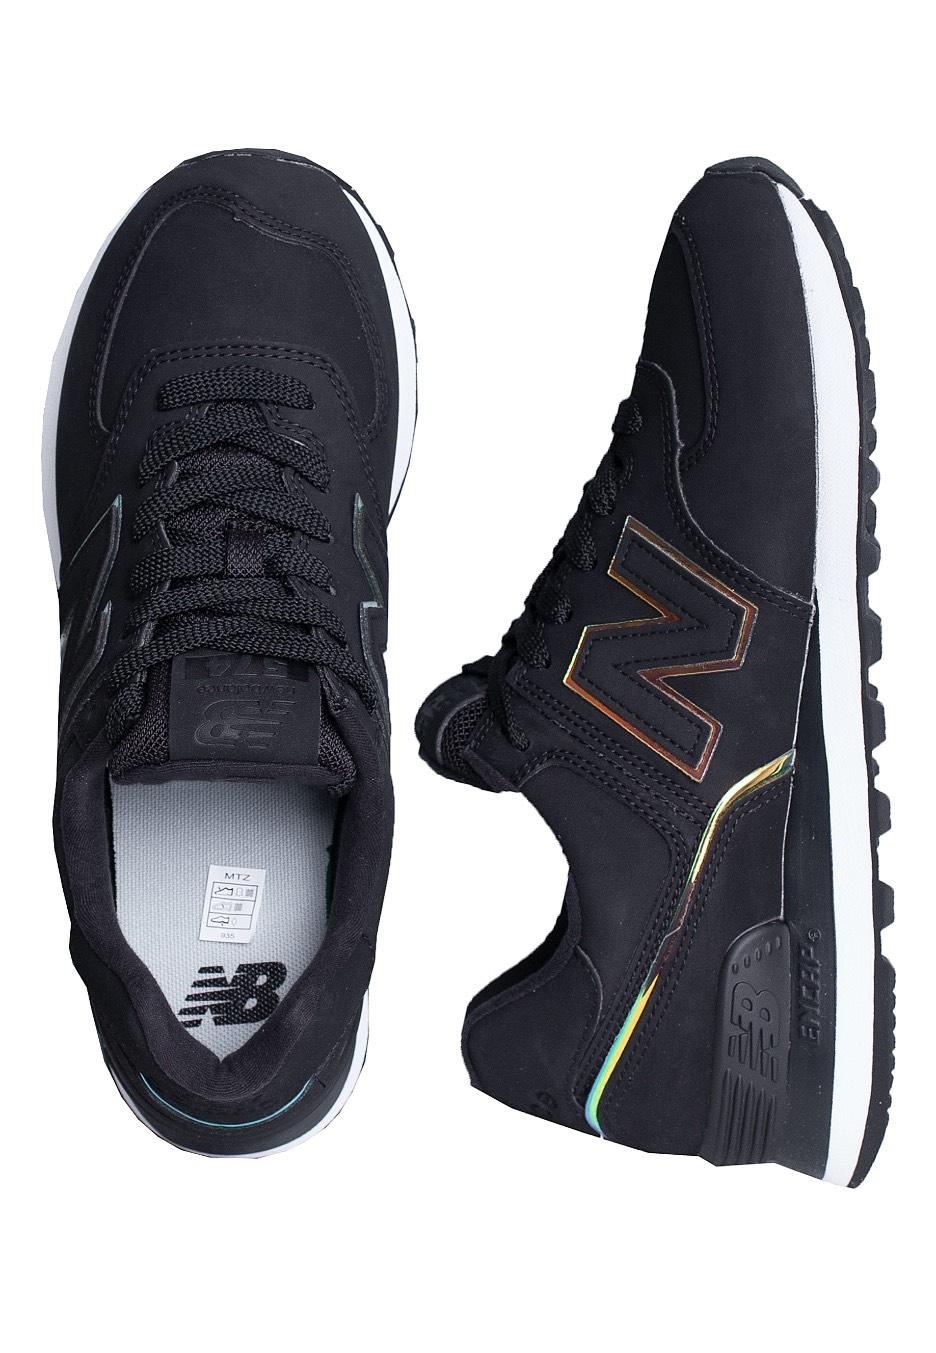 New Balance - Wl574 B CLG Black - Sneakers